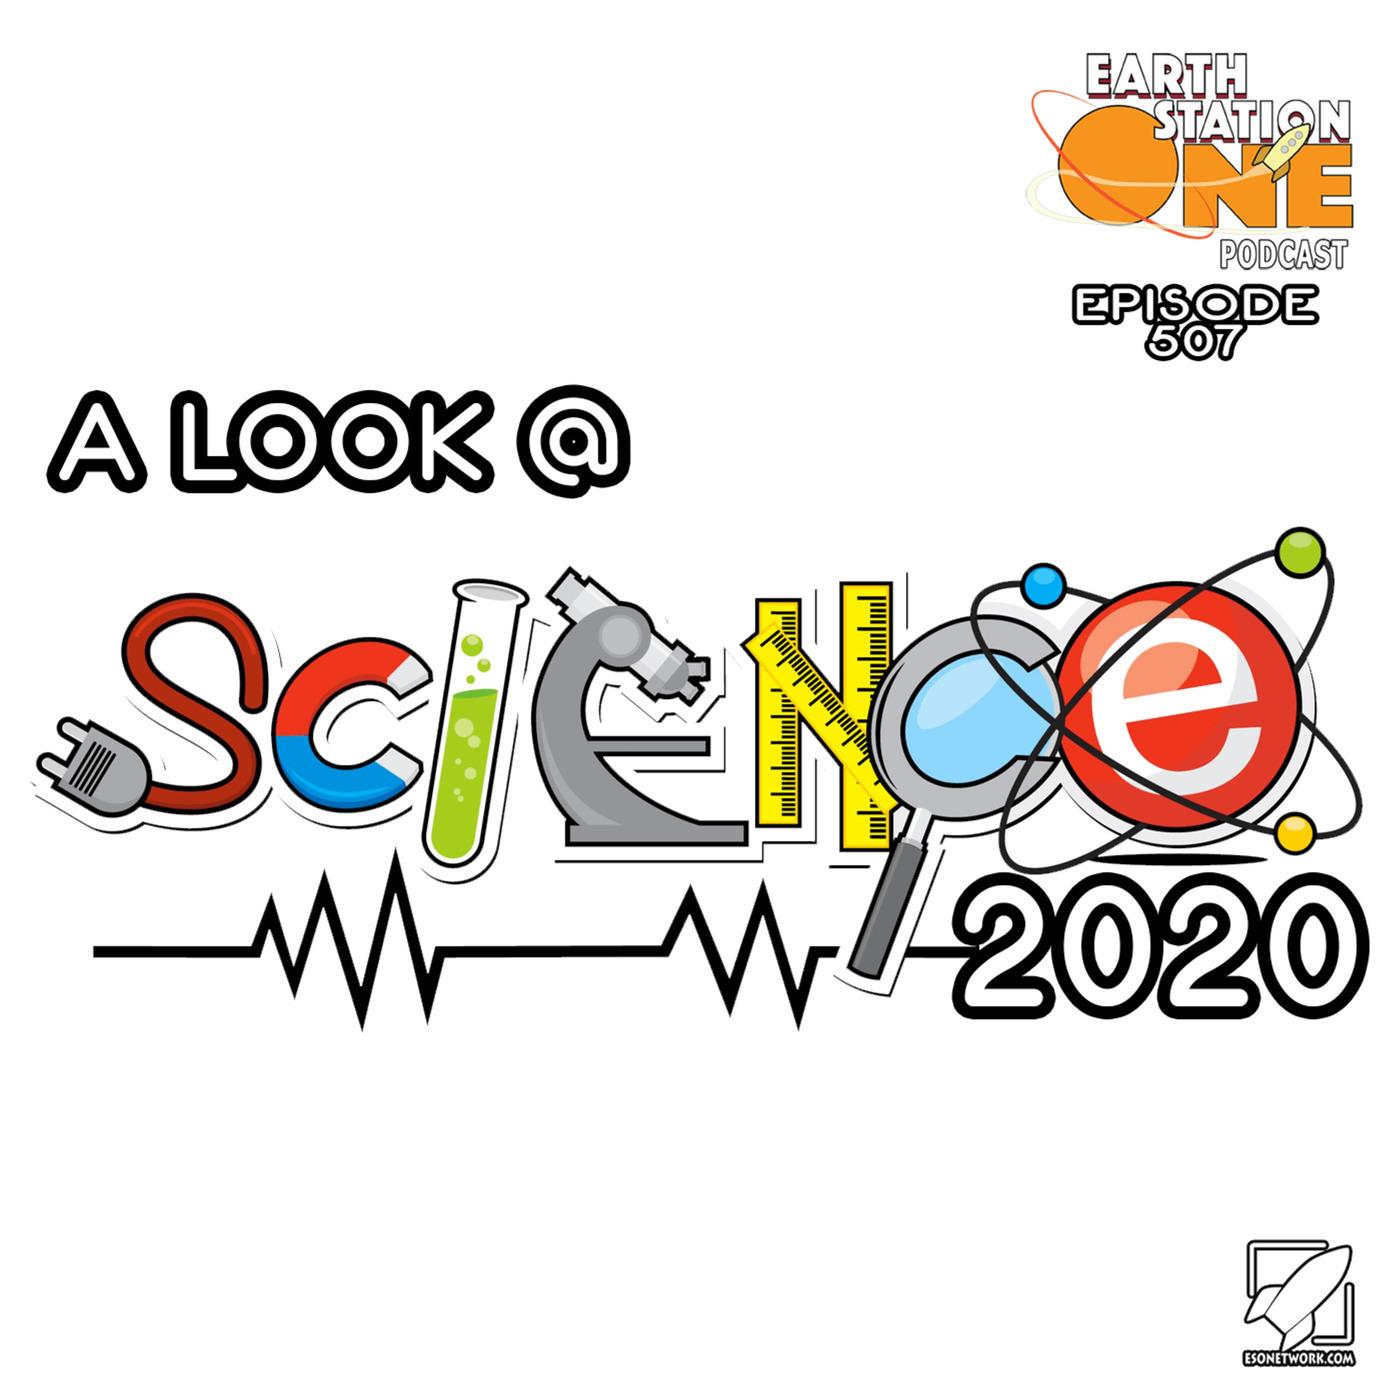 The Earth Station One Podcast alookatscience2020: The Earth Station One Podcast – A Look At Science 2020